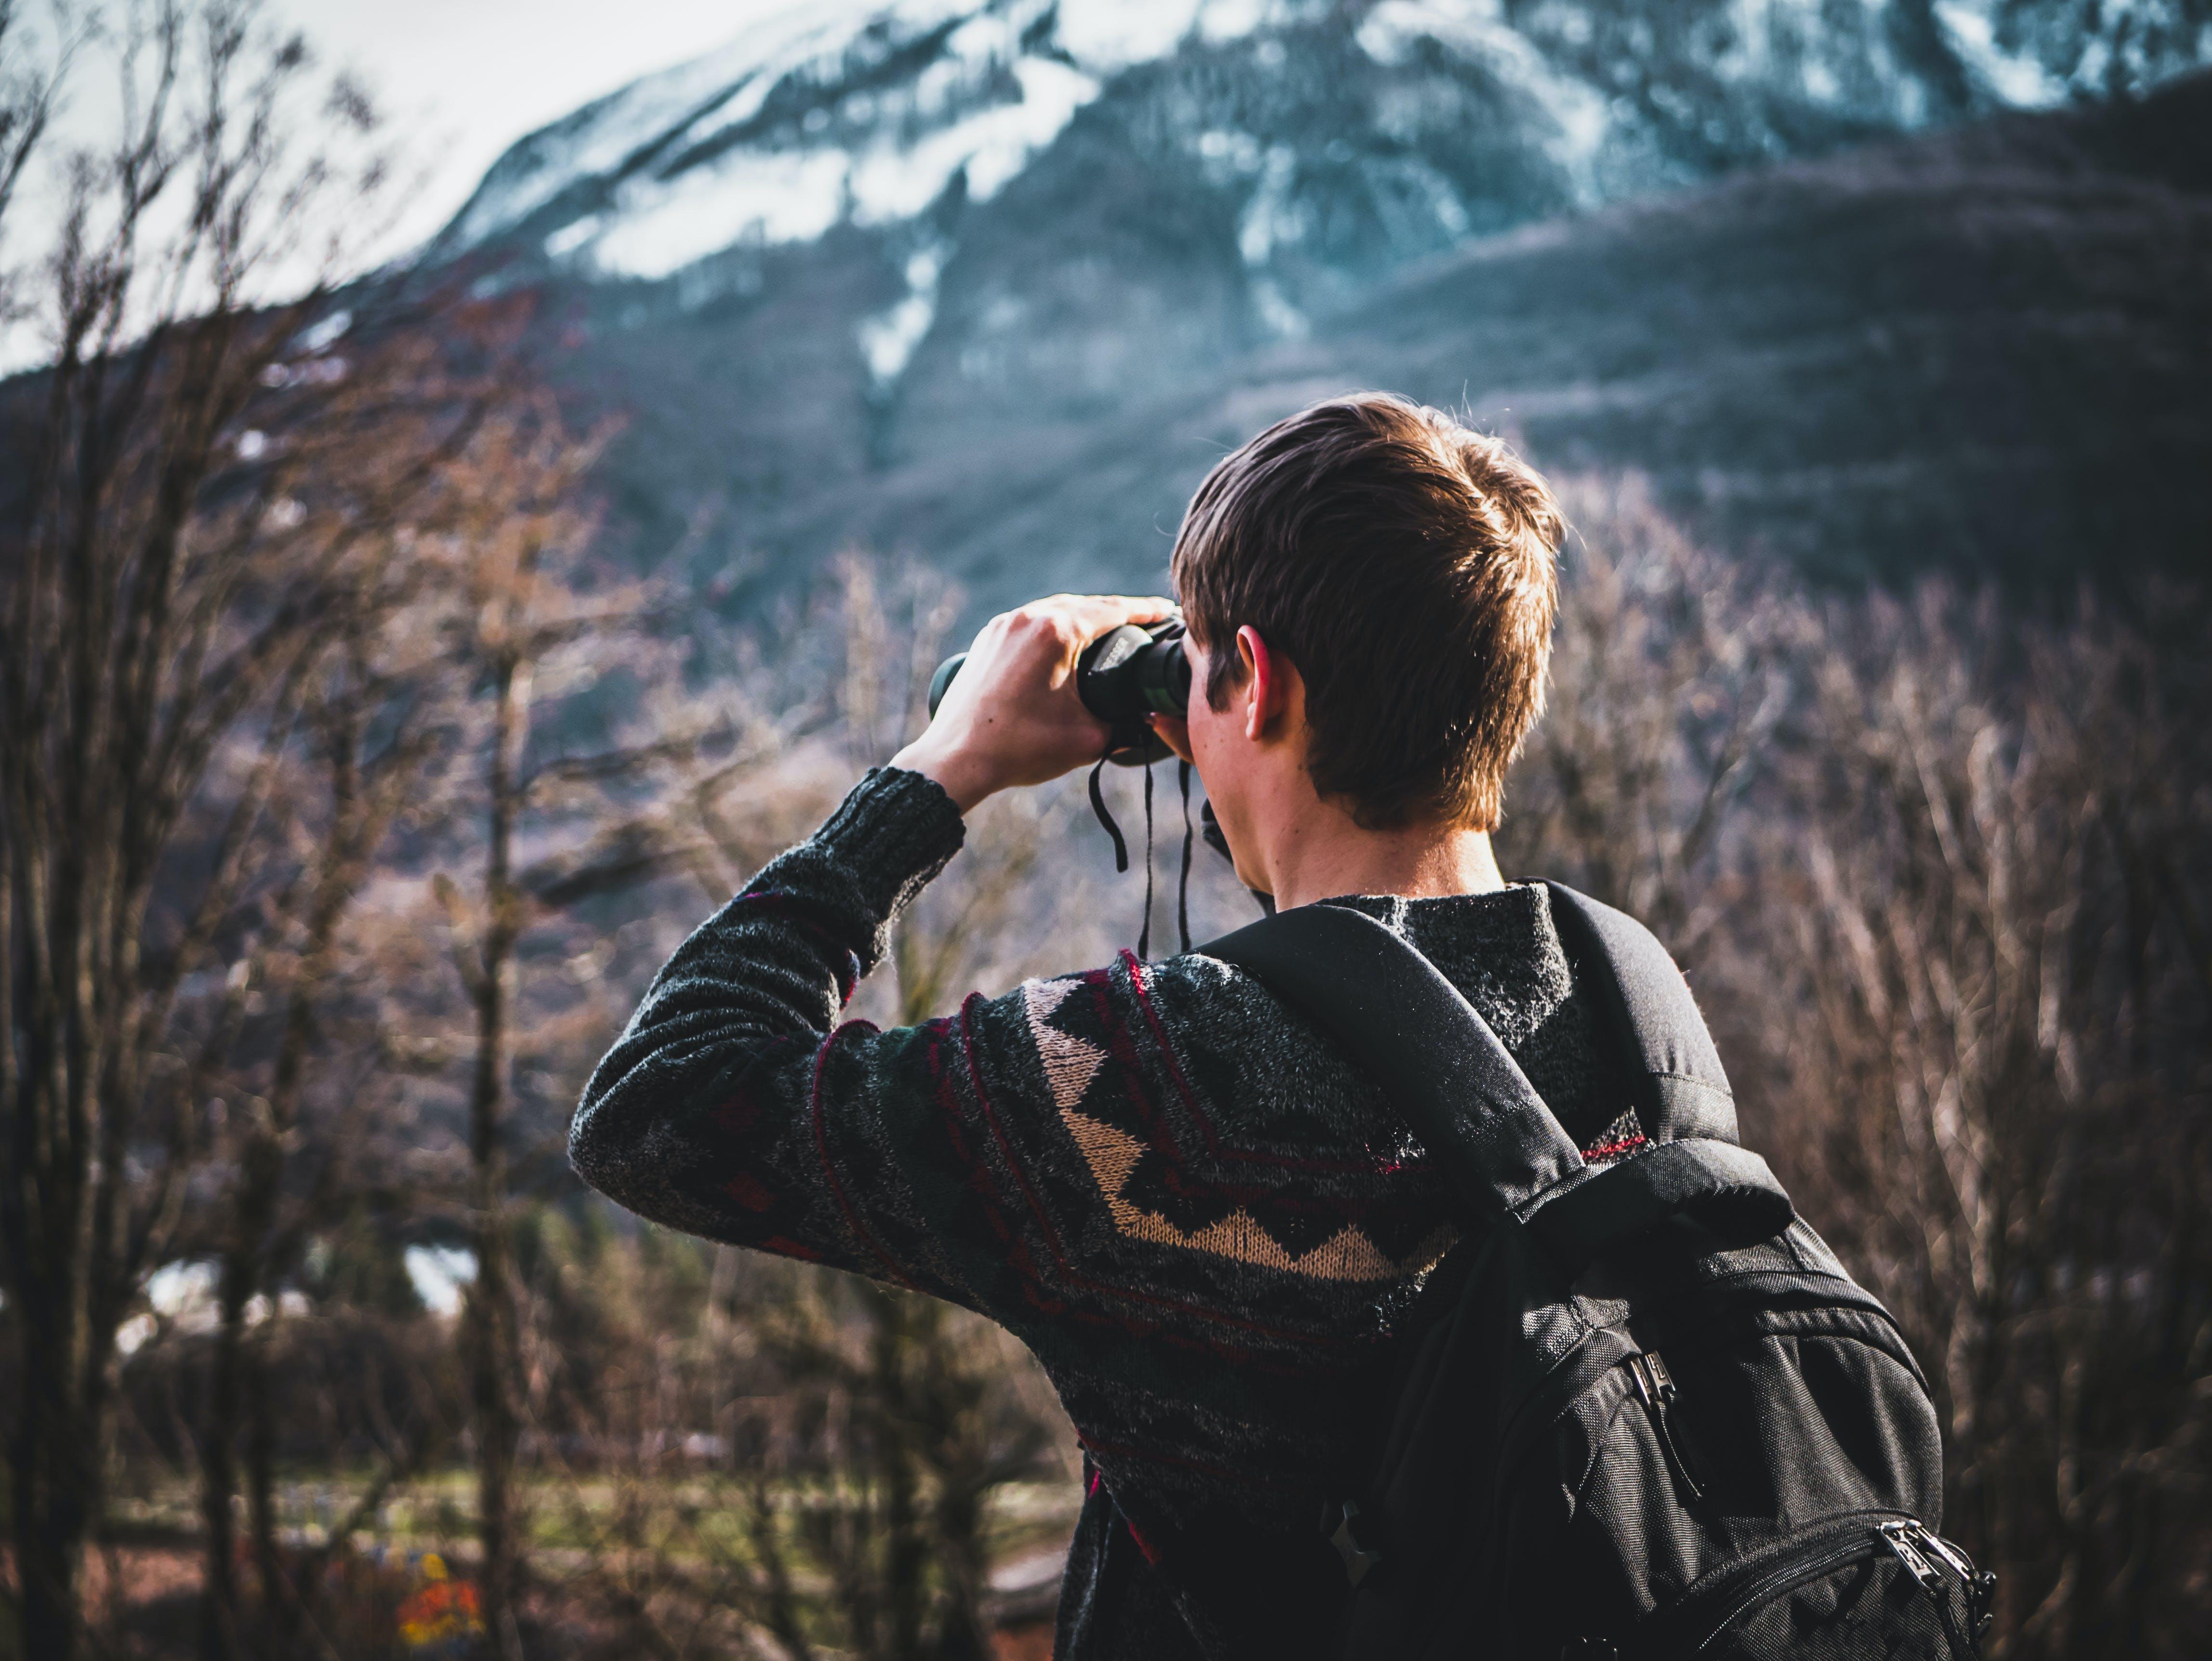 Man Using Black Binoculars Near Forest Trees at Daytime